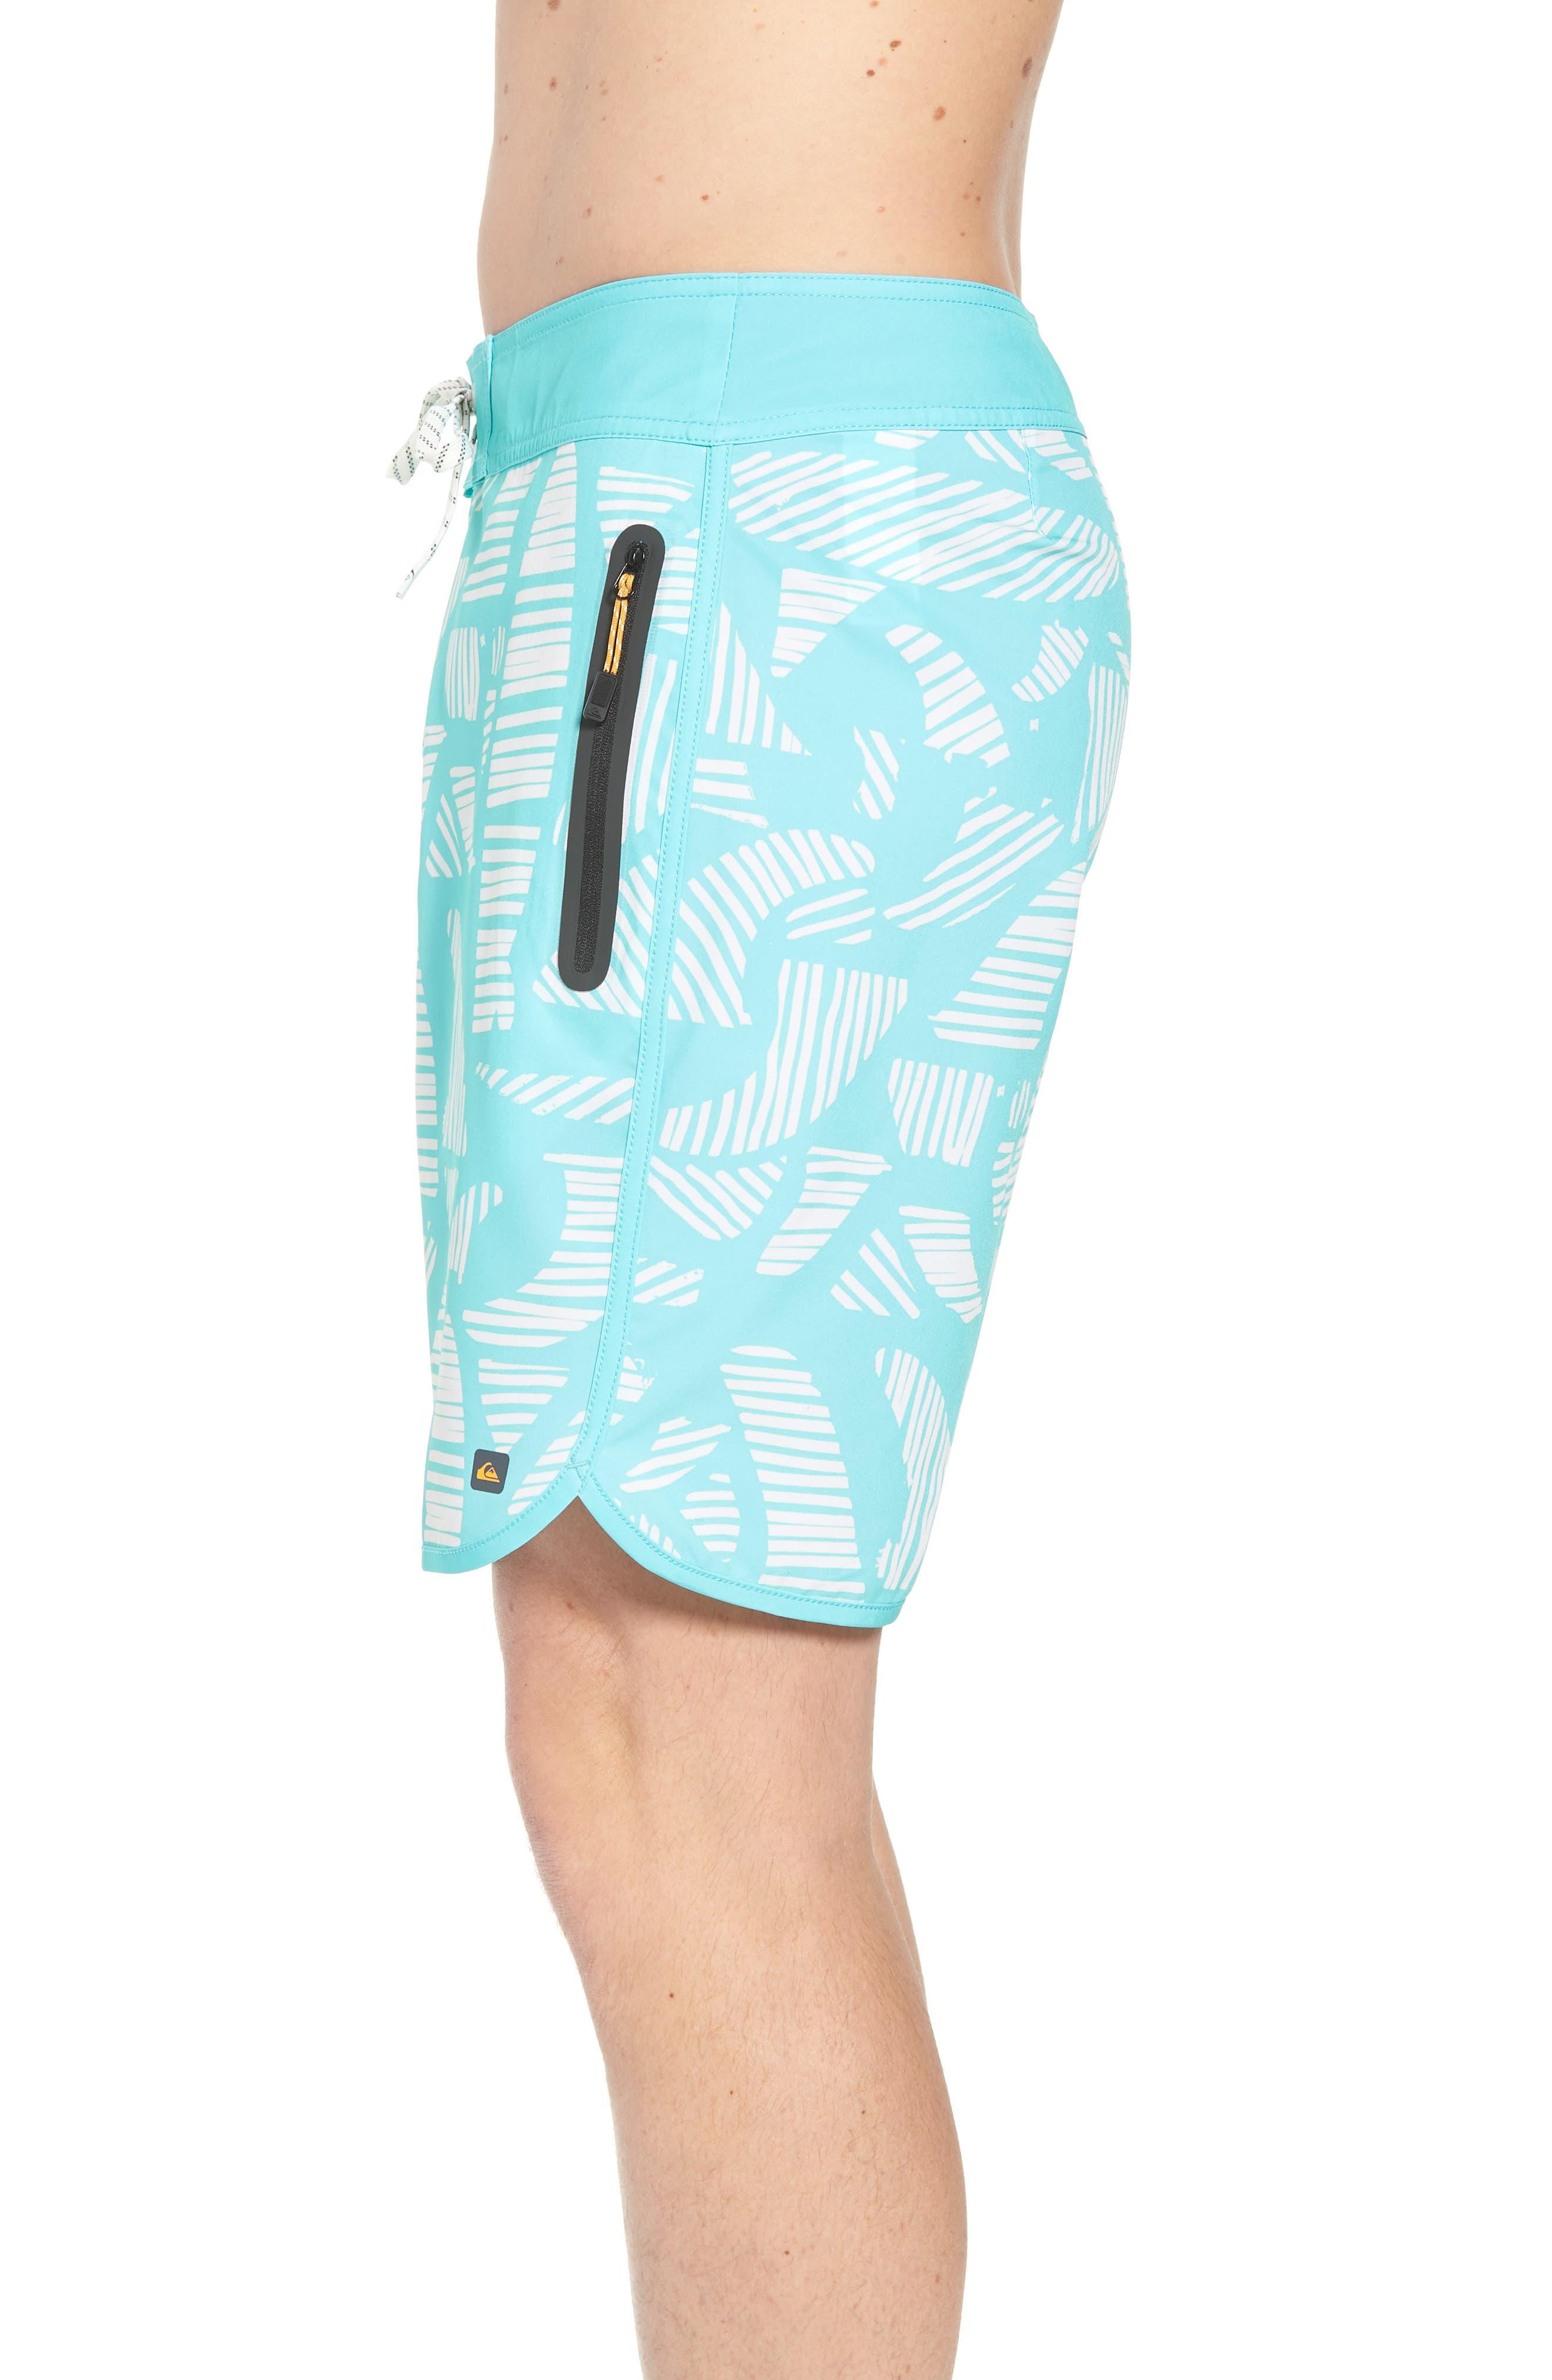 Odysea Board Shorts,                             Alternate thumbnail 4, color,                             BLUE RADIANCE